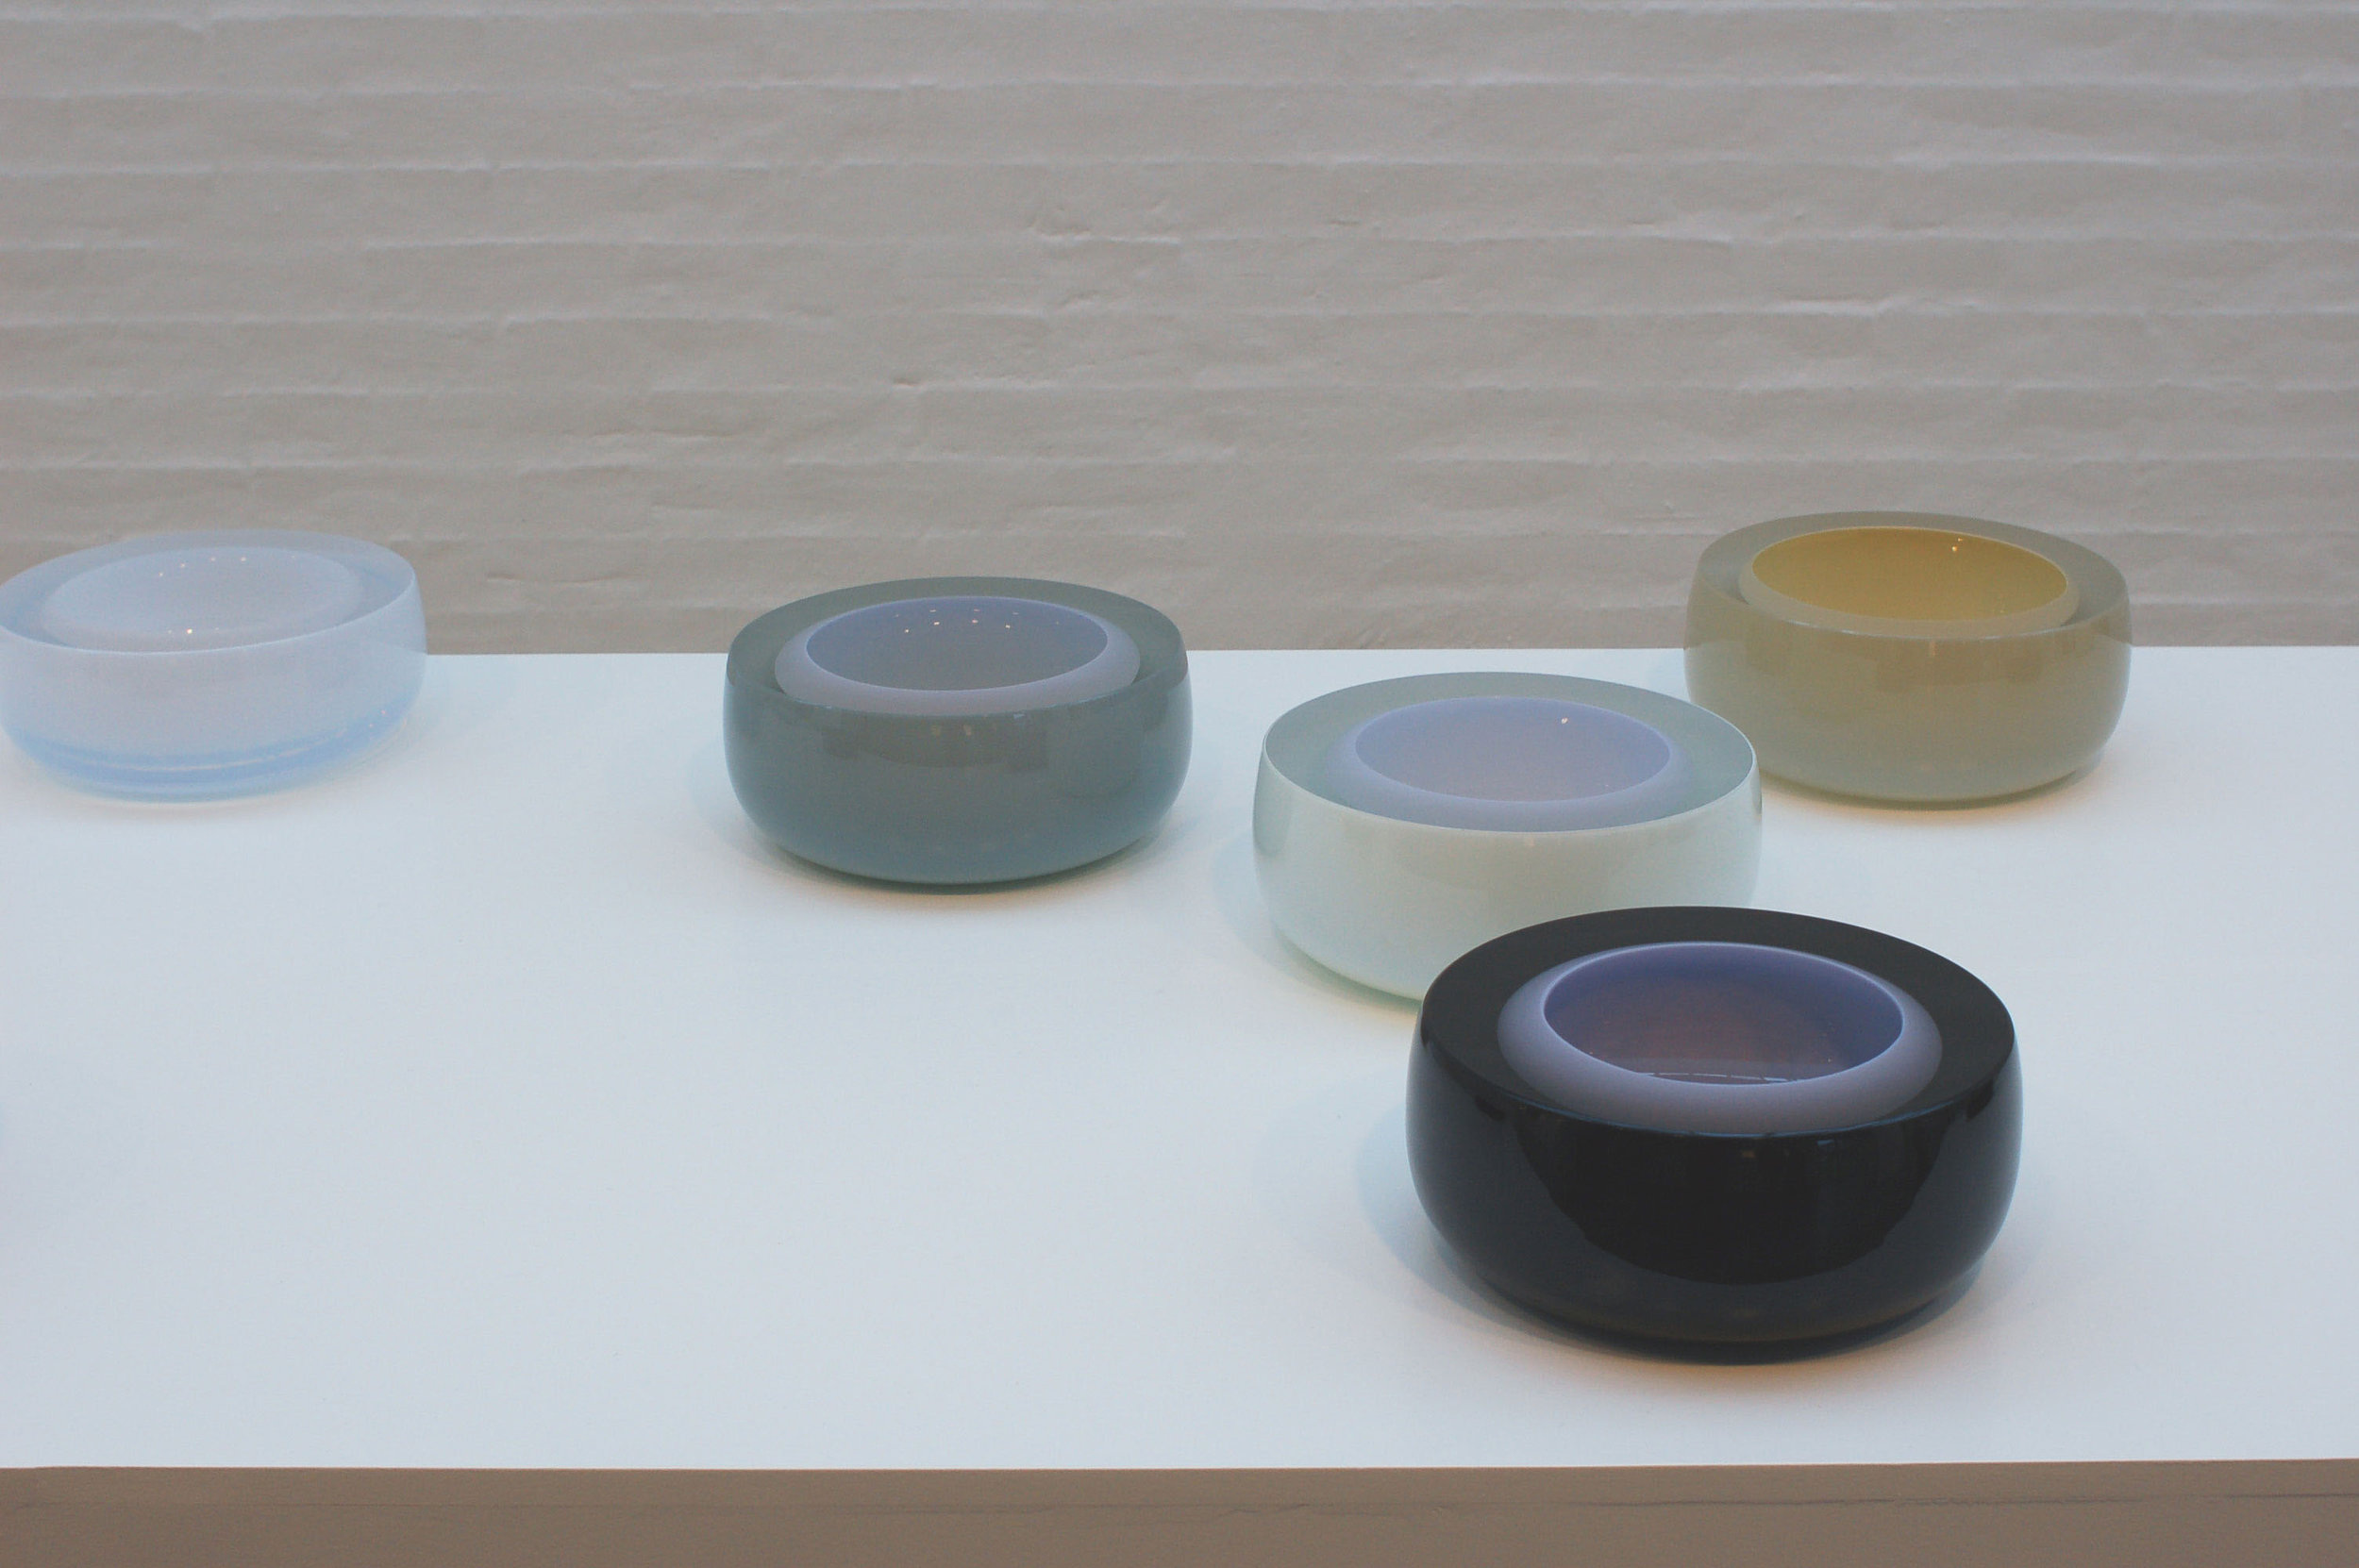 glass-bowls-exhibited-2--kopi.jpg